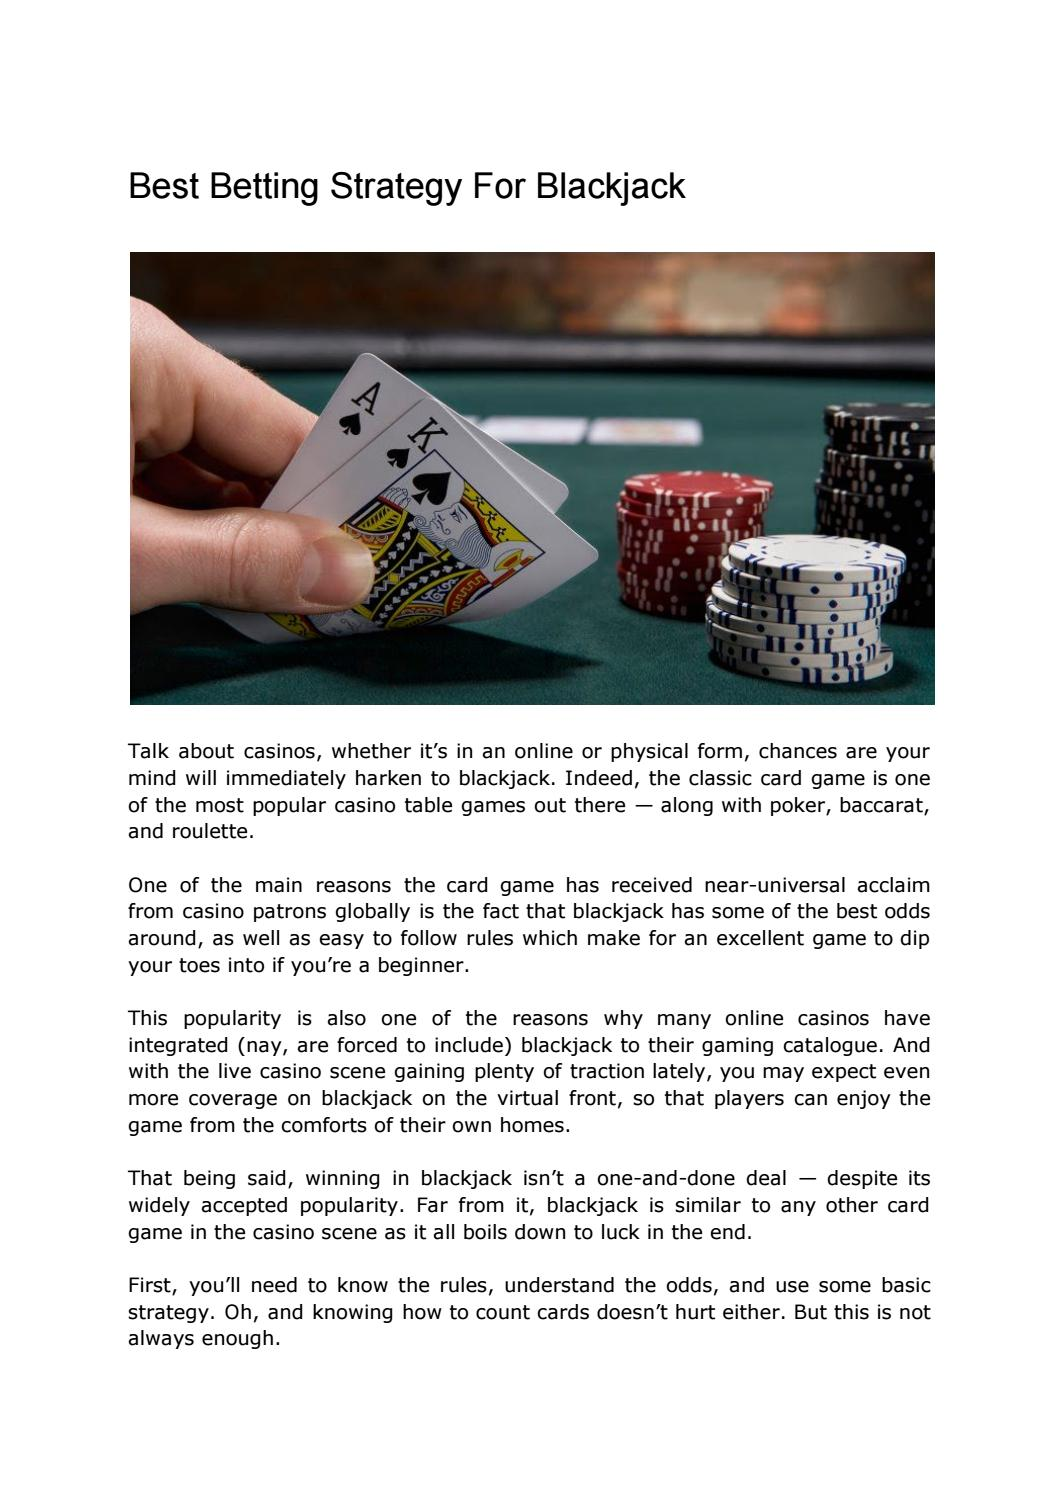 Own goal betting rules of blackjack football betting line